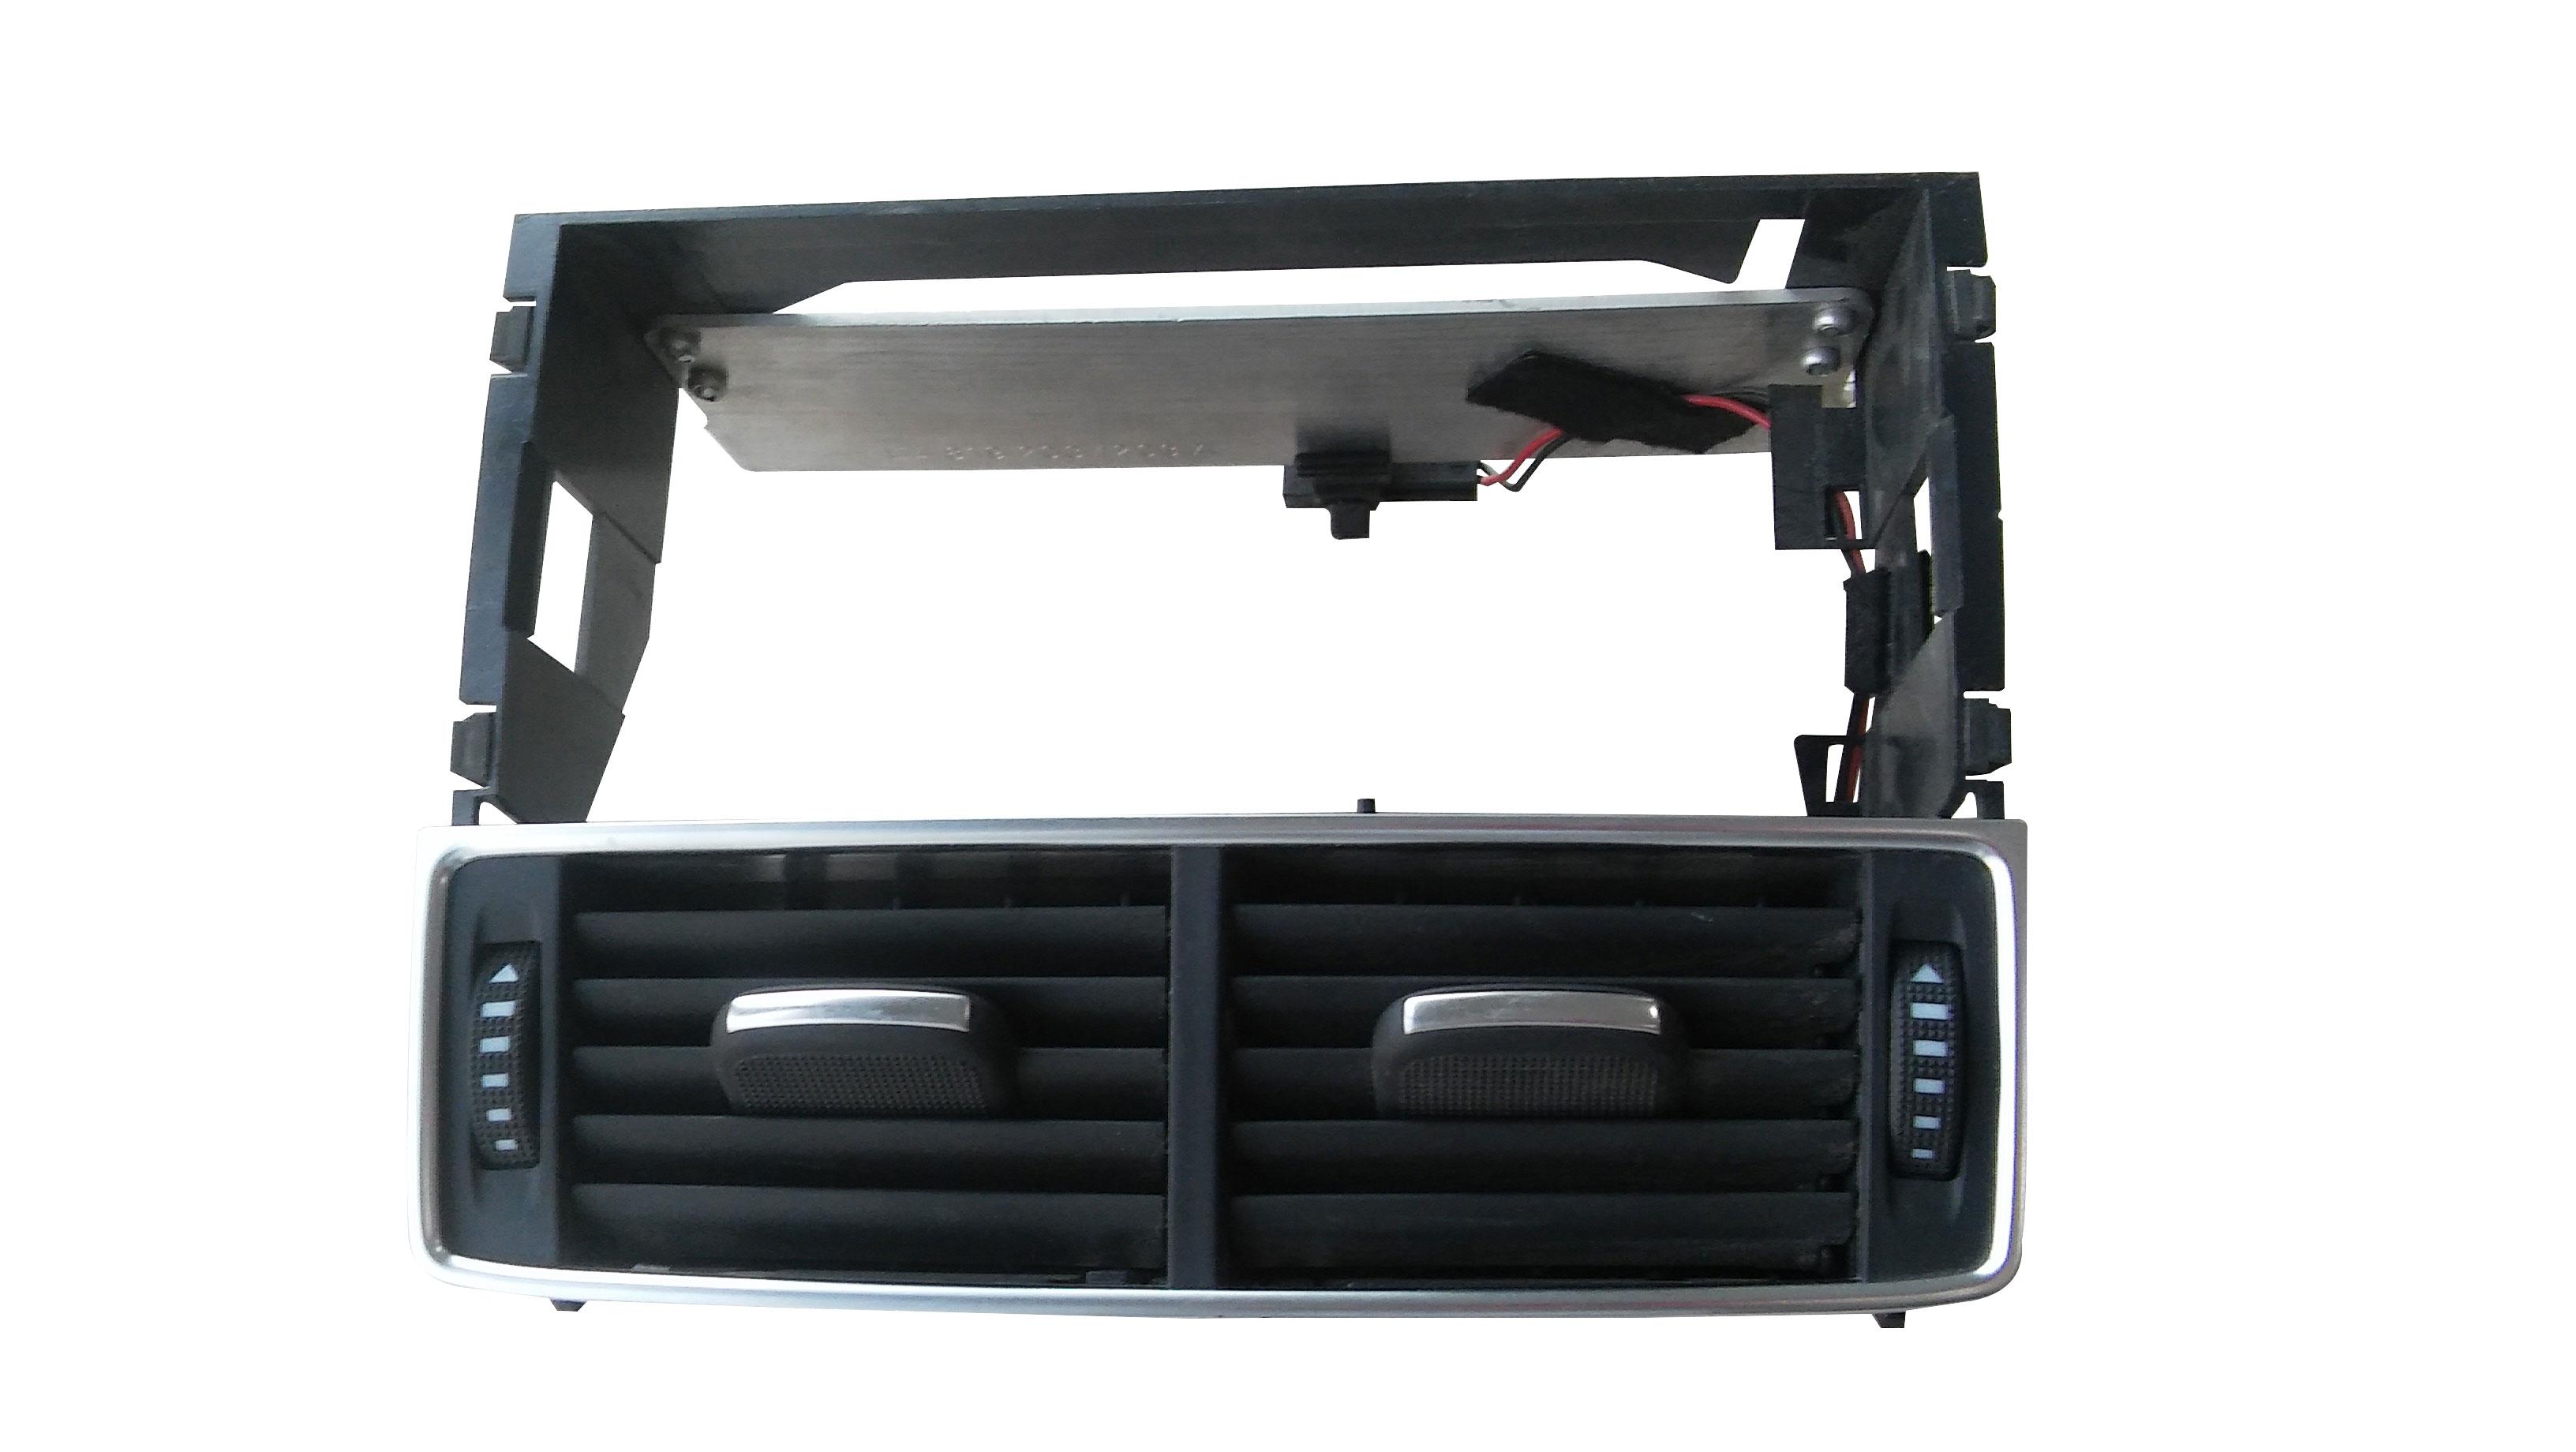 Arka Orta Havalandırma - Audi A8 2004 > 2010